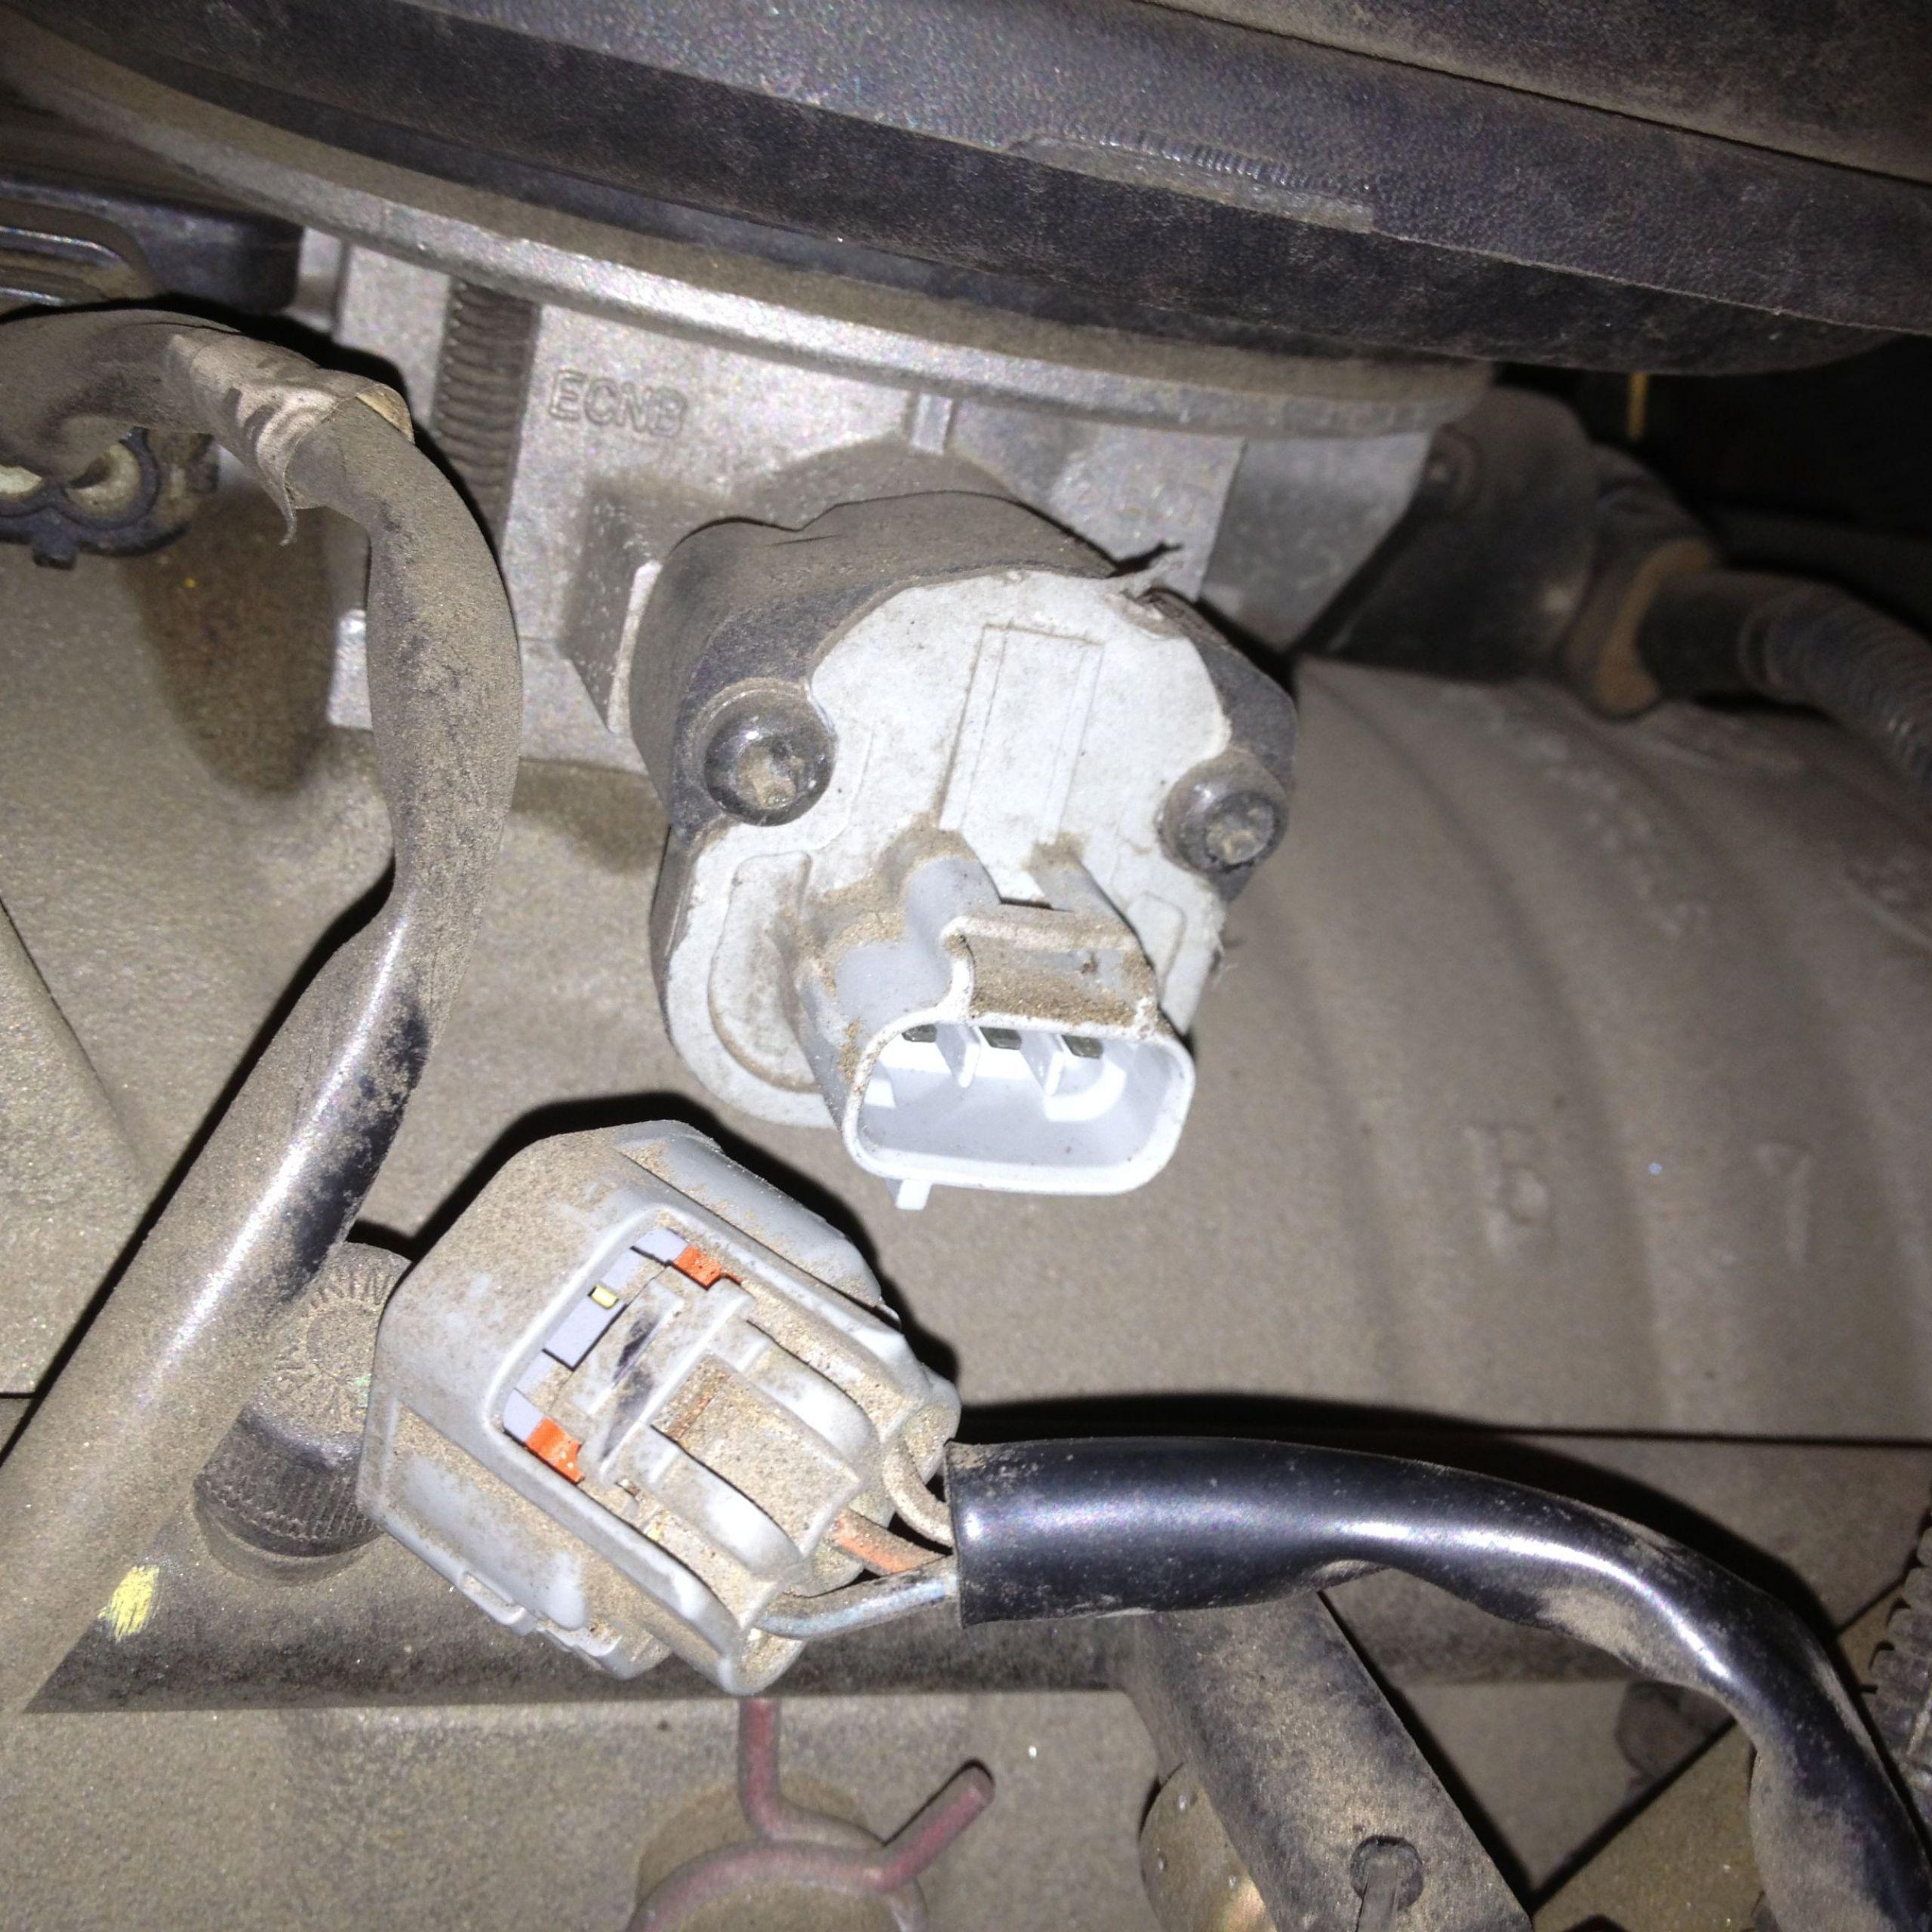 2012 Dodge Durango Luxury Fixing Dodge Durango Transmission Problems By Replacing